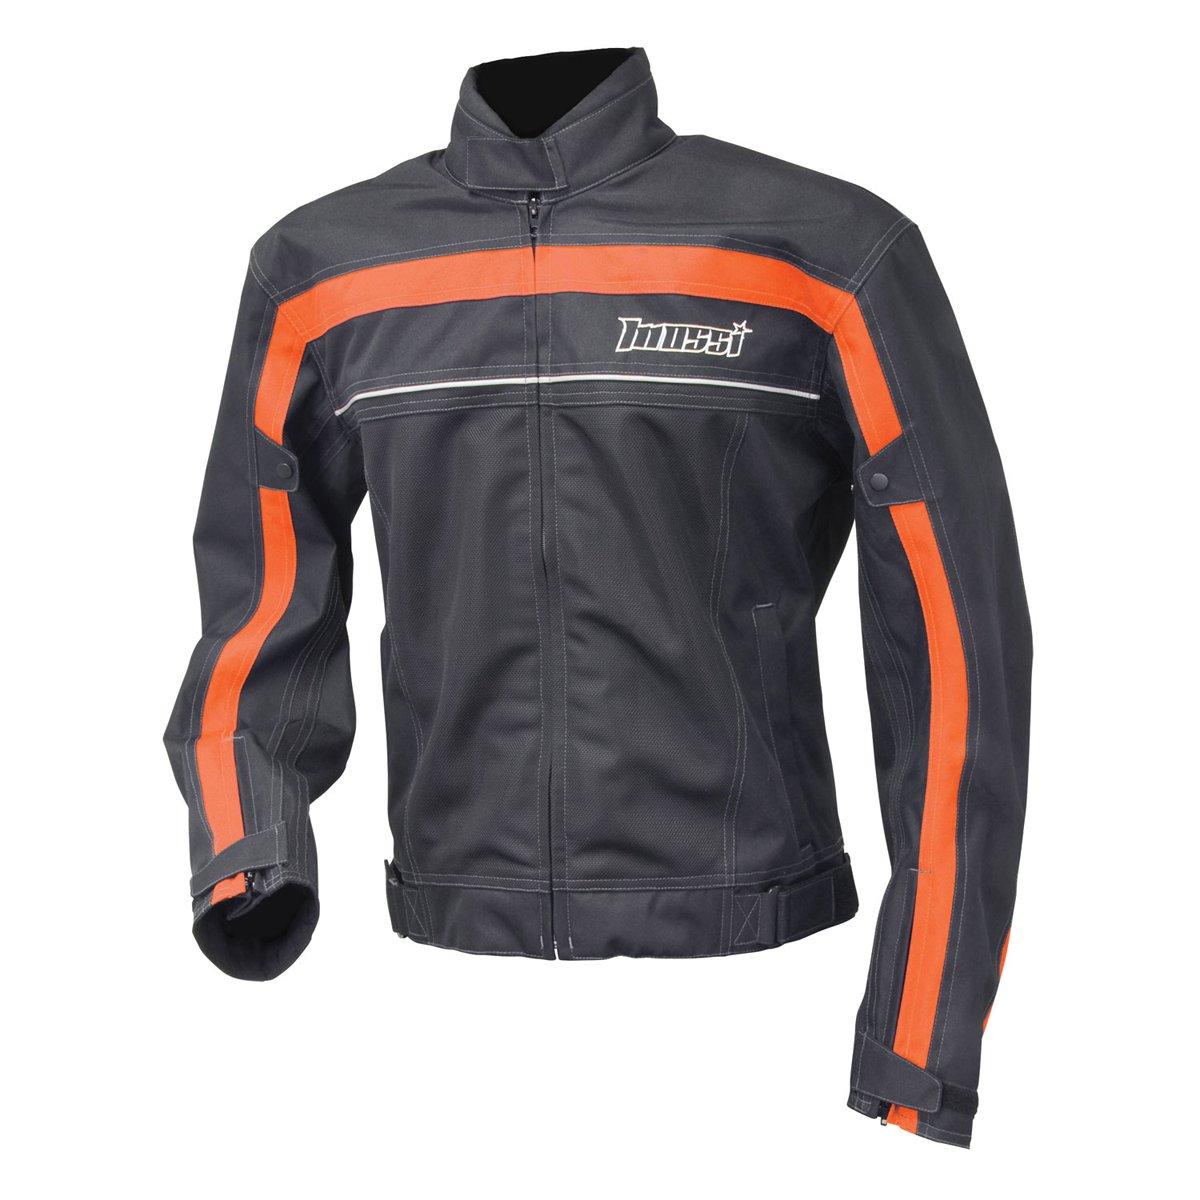 Mossi Jaunt Men's Jacket (Orange, Large)